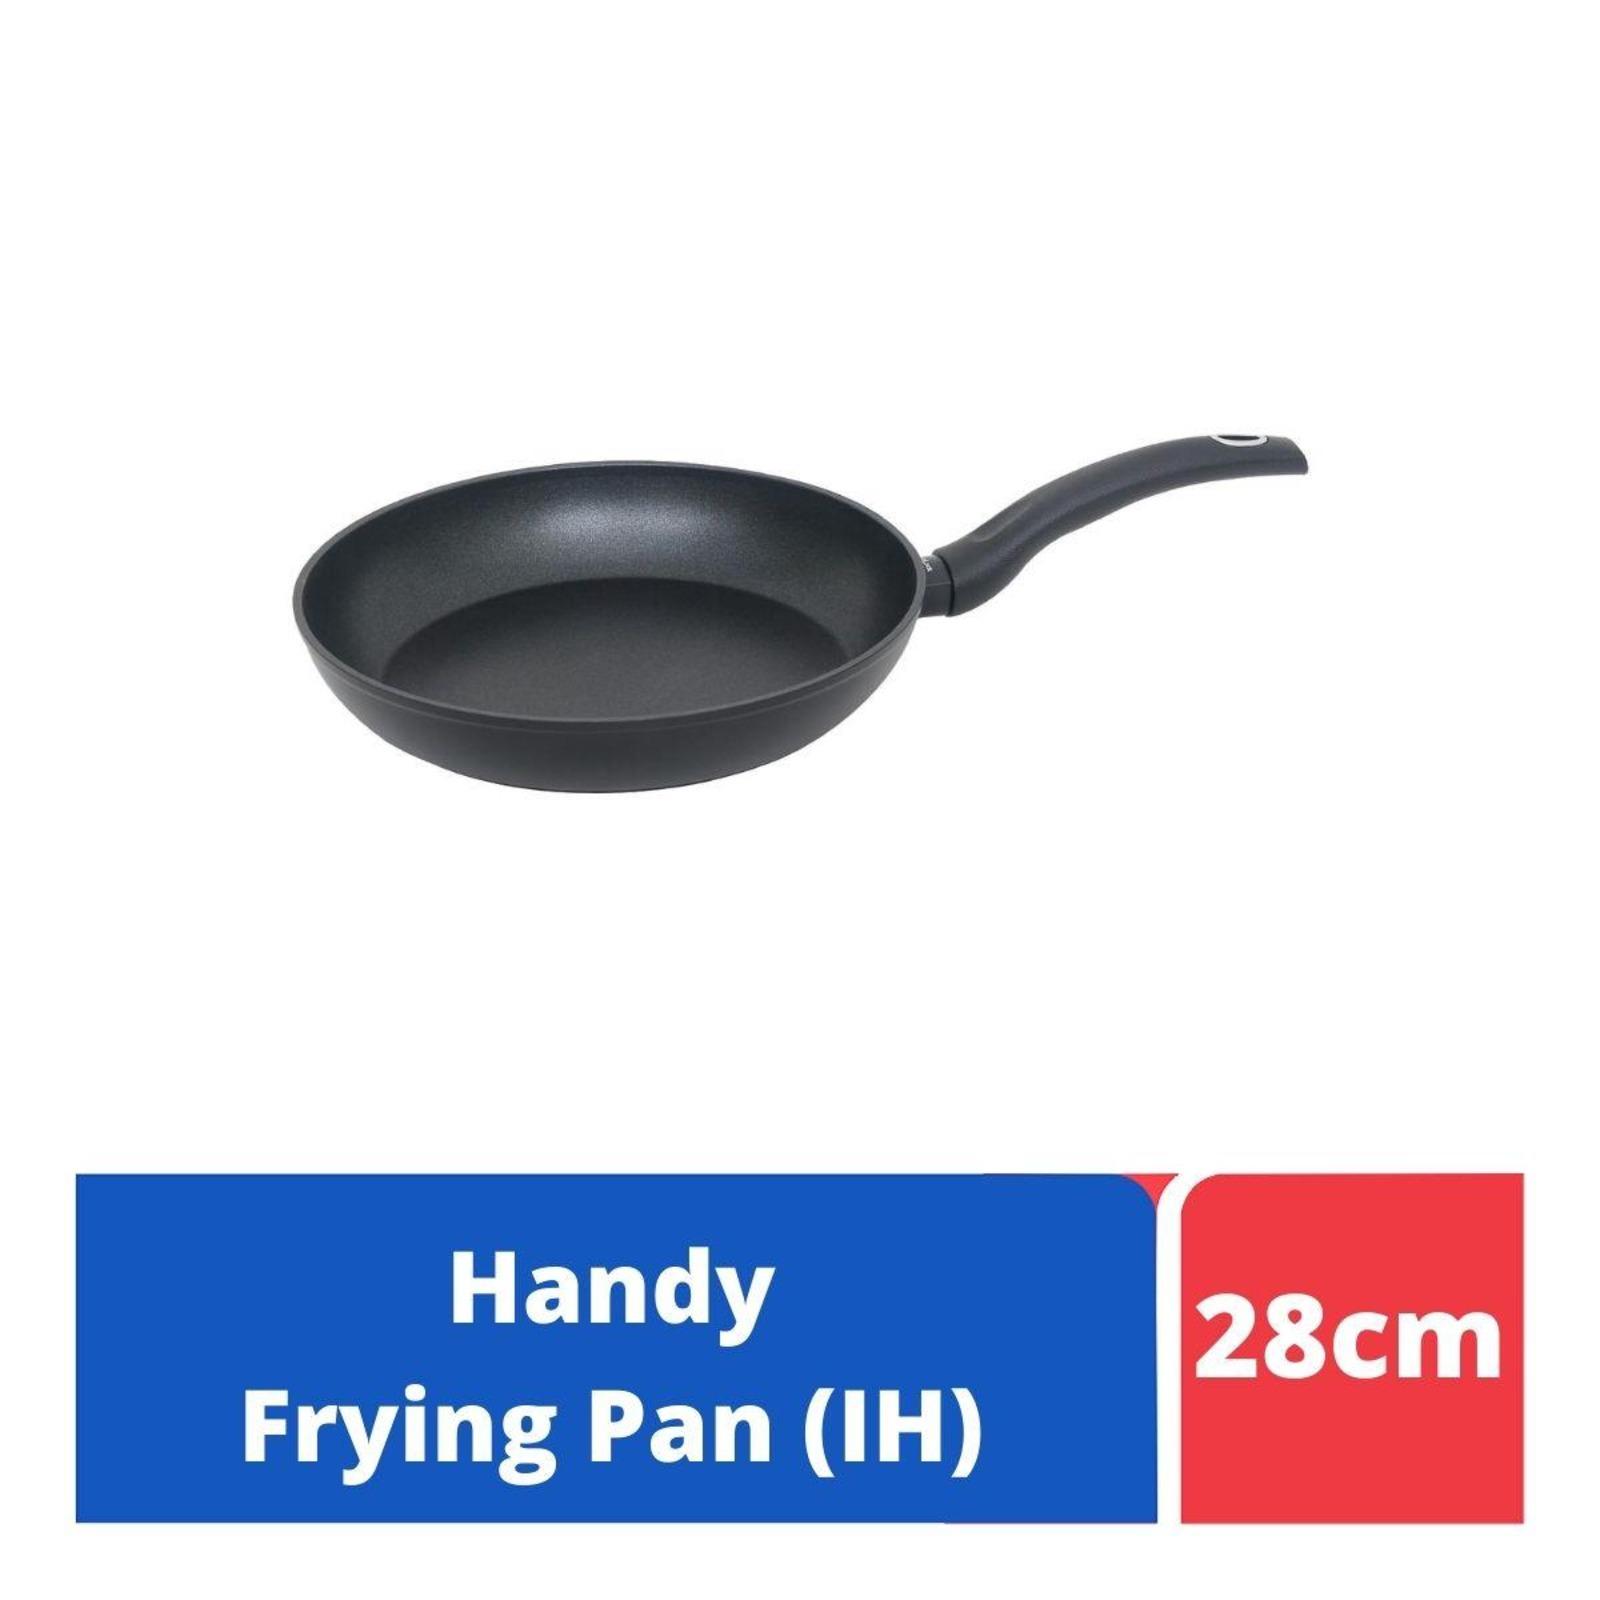 LOCK&LOCK Handy IH Frying Pan 28cm